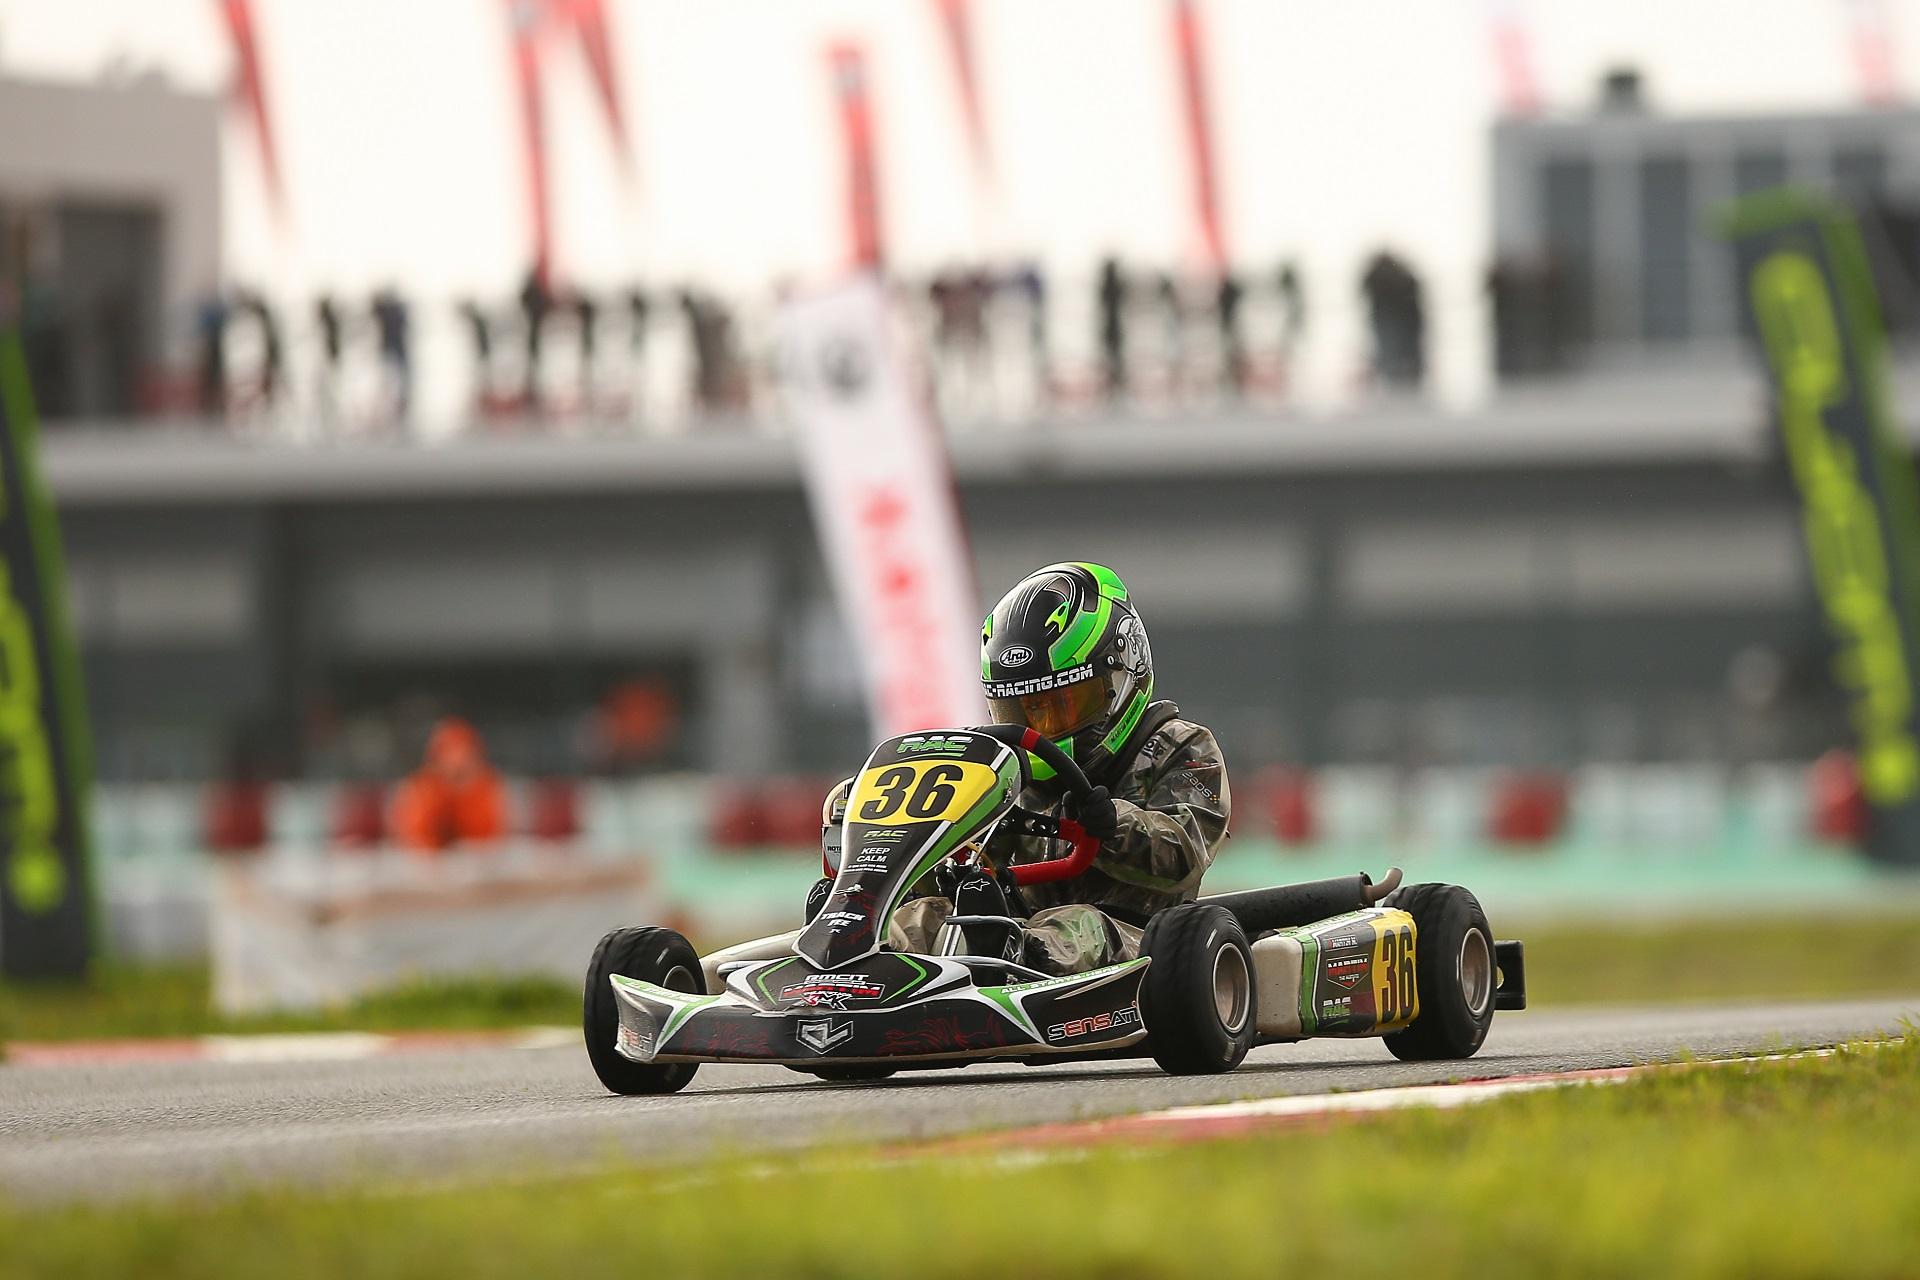 Martim Marques foi hoje 3.º classificado na 1.ª manga do Rotax International Trophy